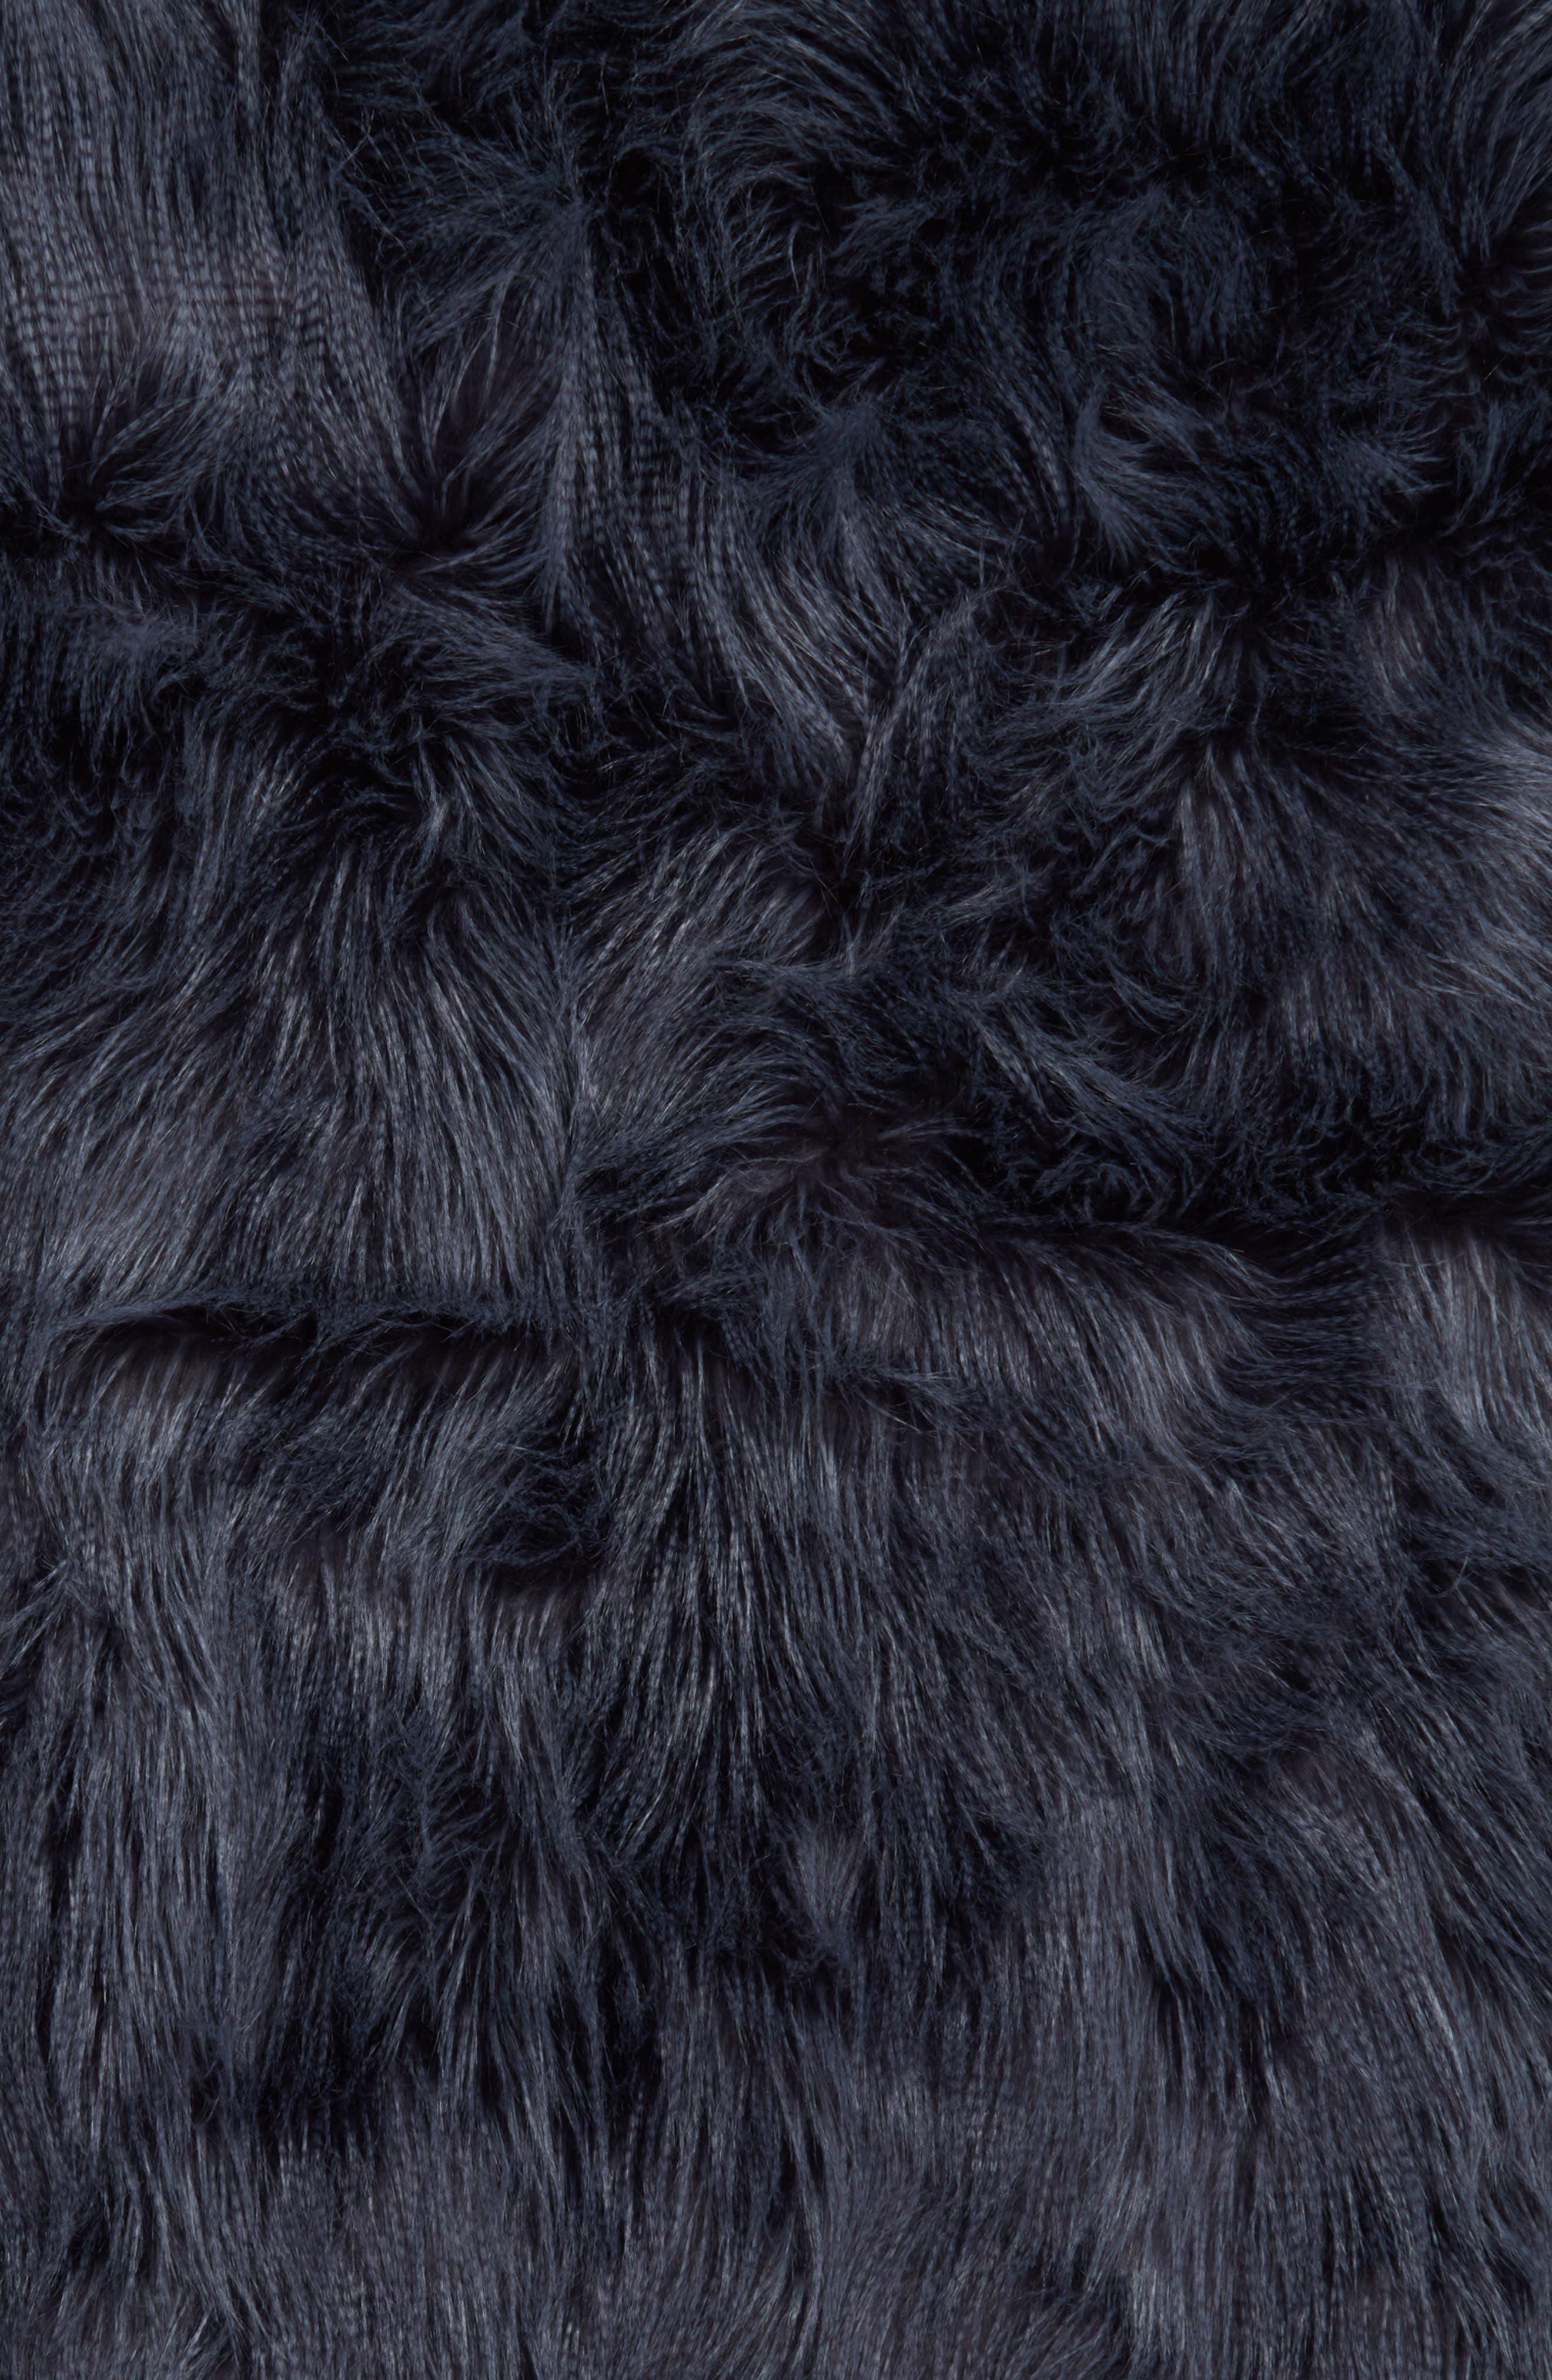 Fauna Faux Fur Throw Blanket,                             Alternate thumbnail 2, color,                             Navy Armada